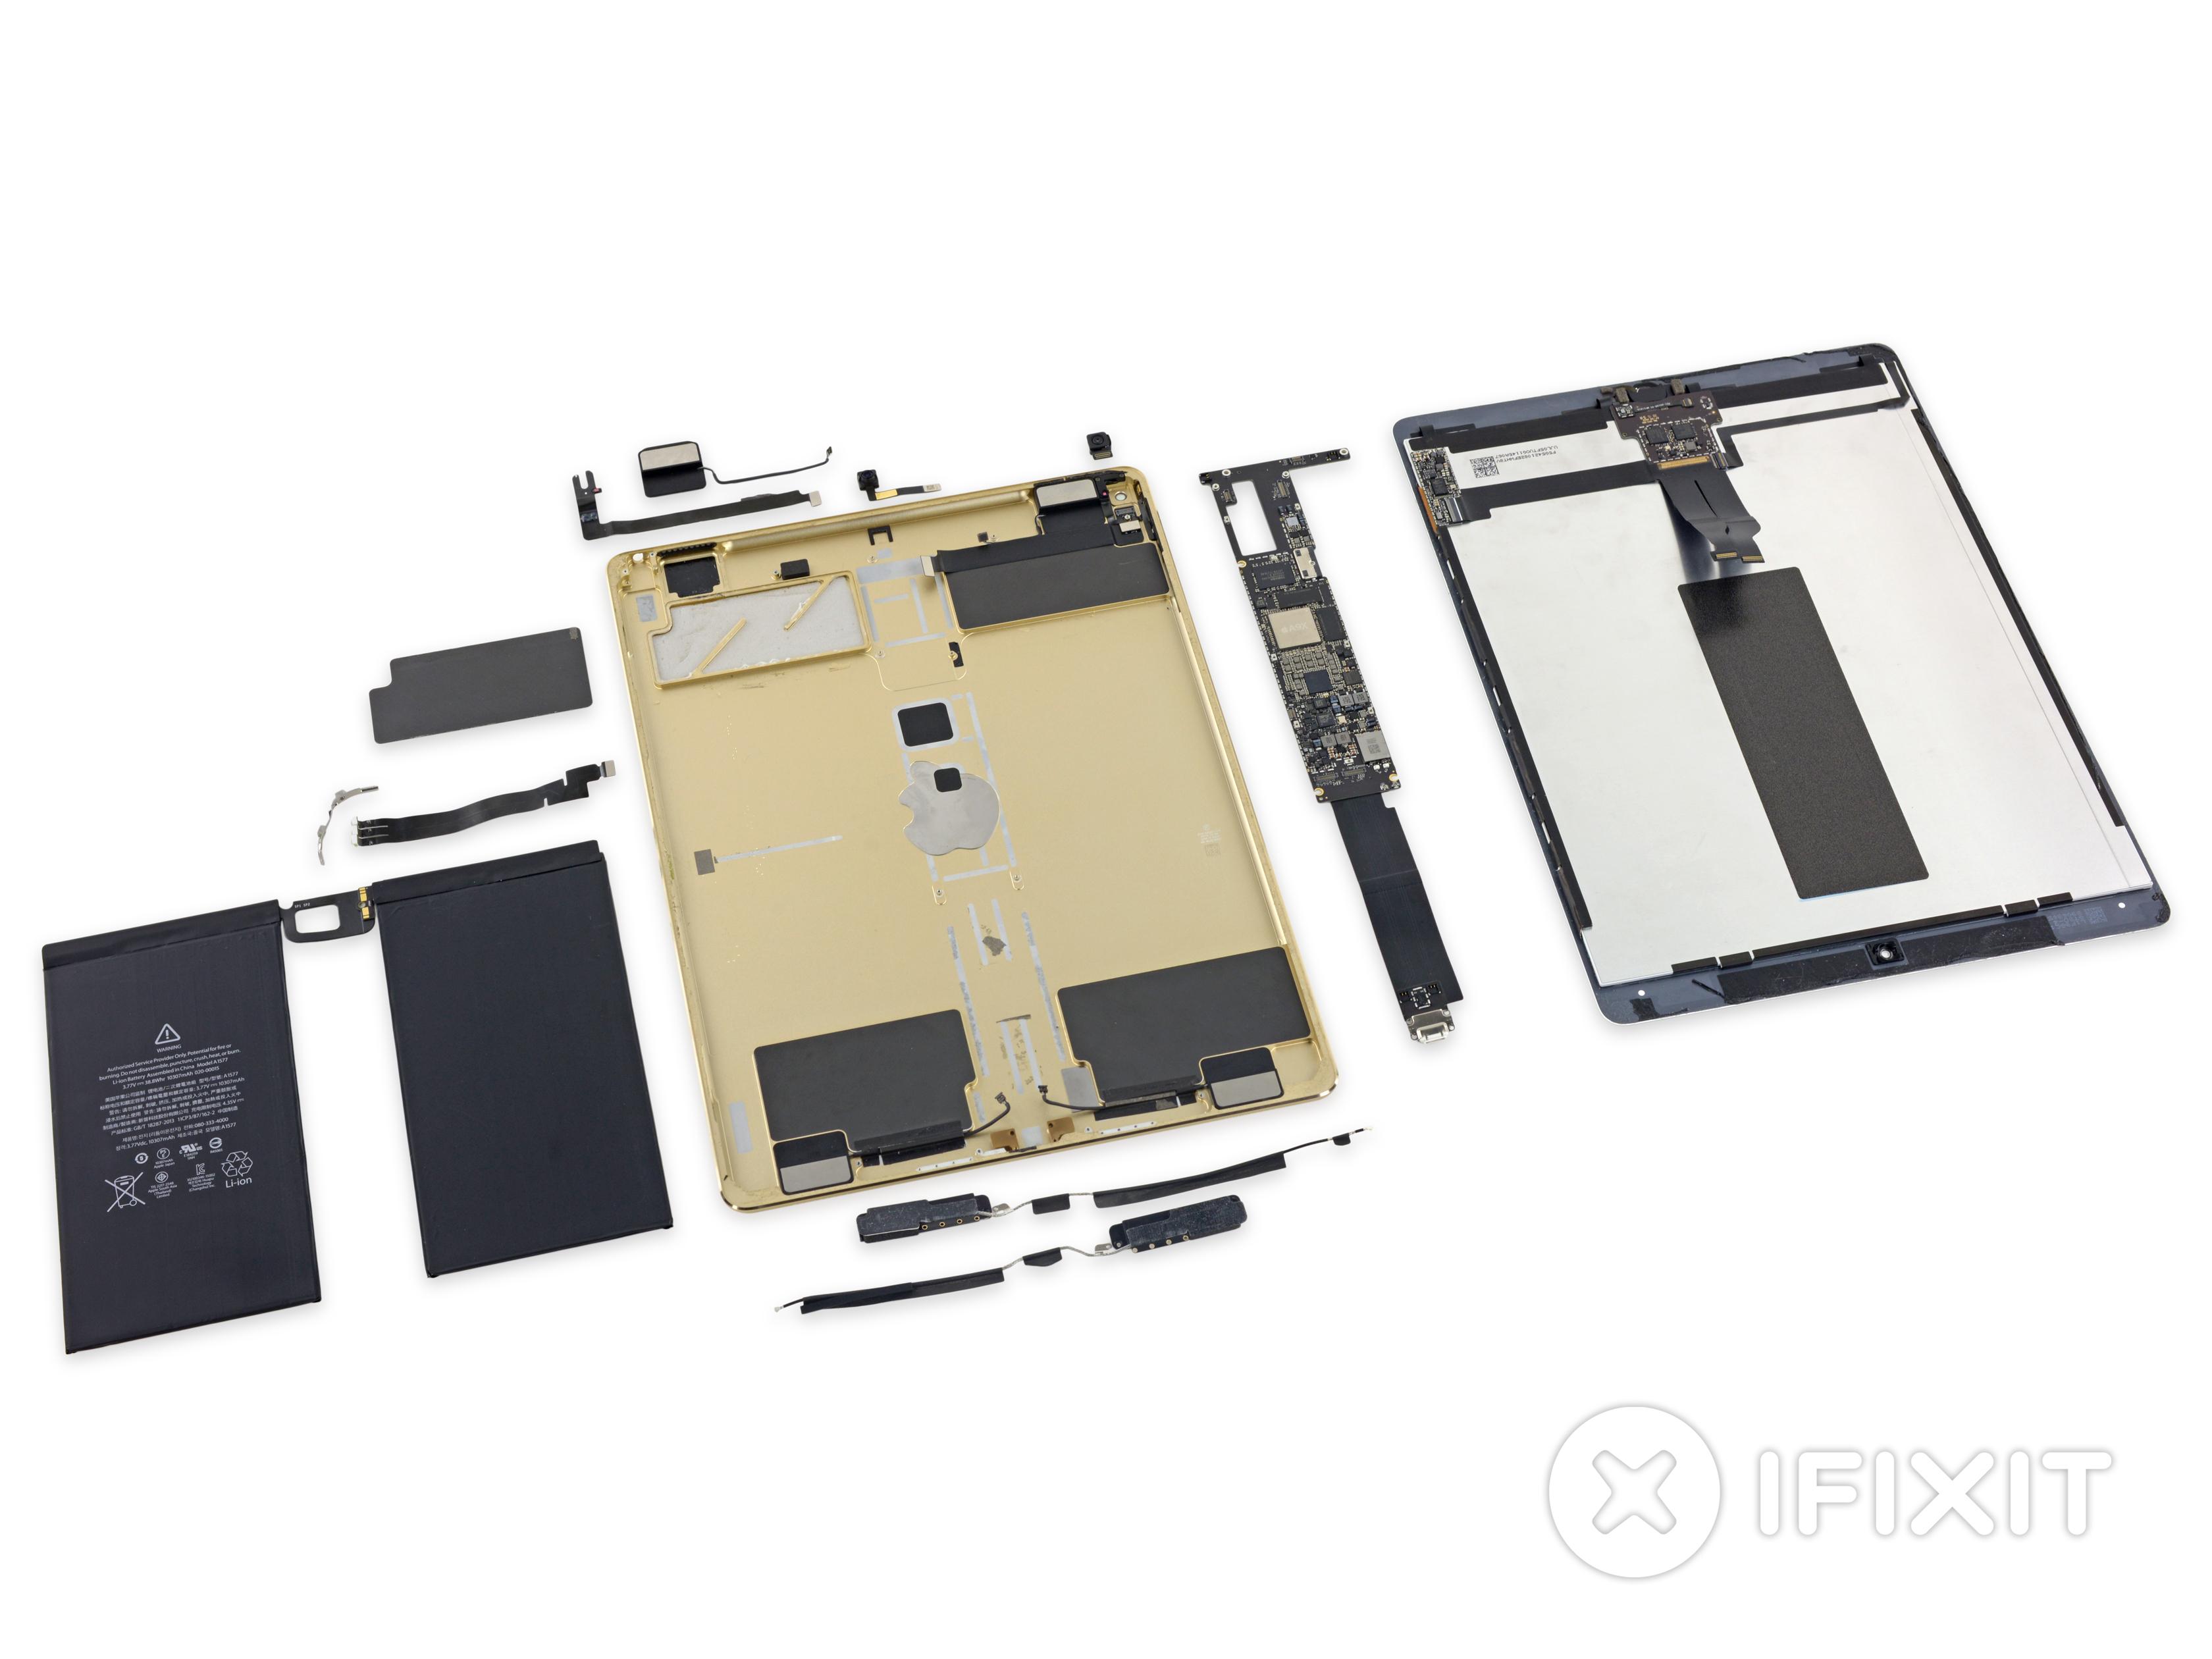 Ipad Pro 129 Teardown Ifixit Jack Antenna Wiring Diagram